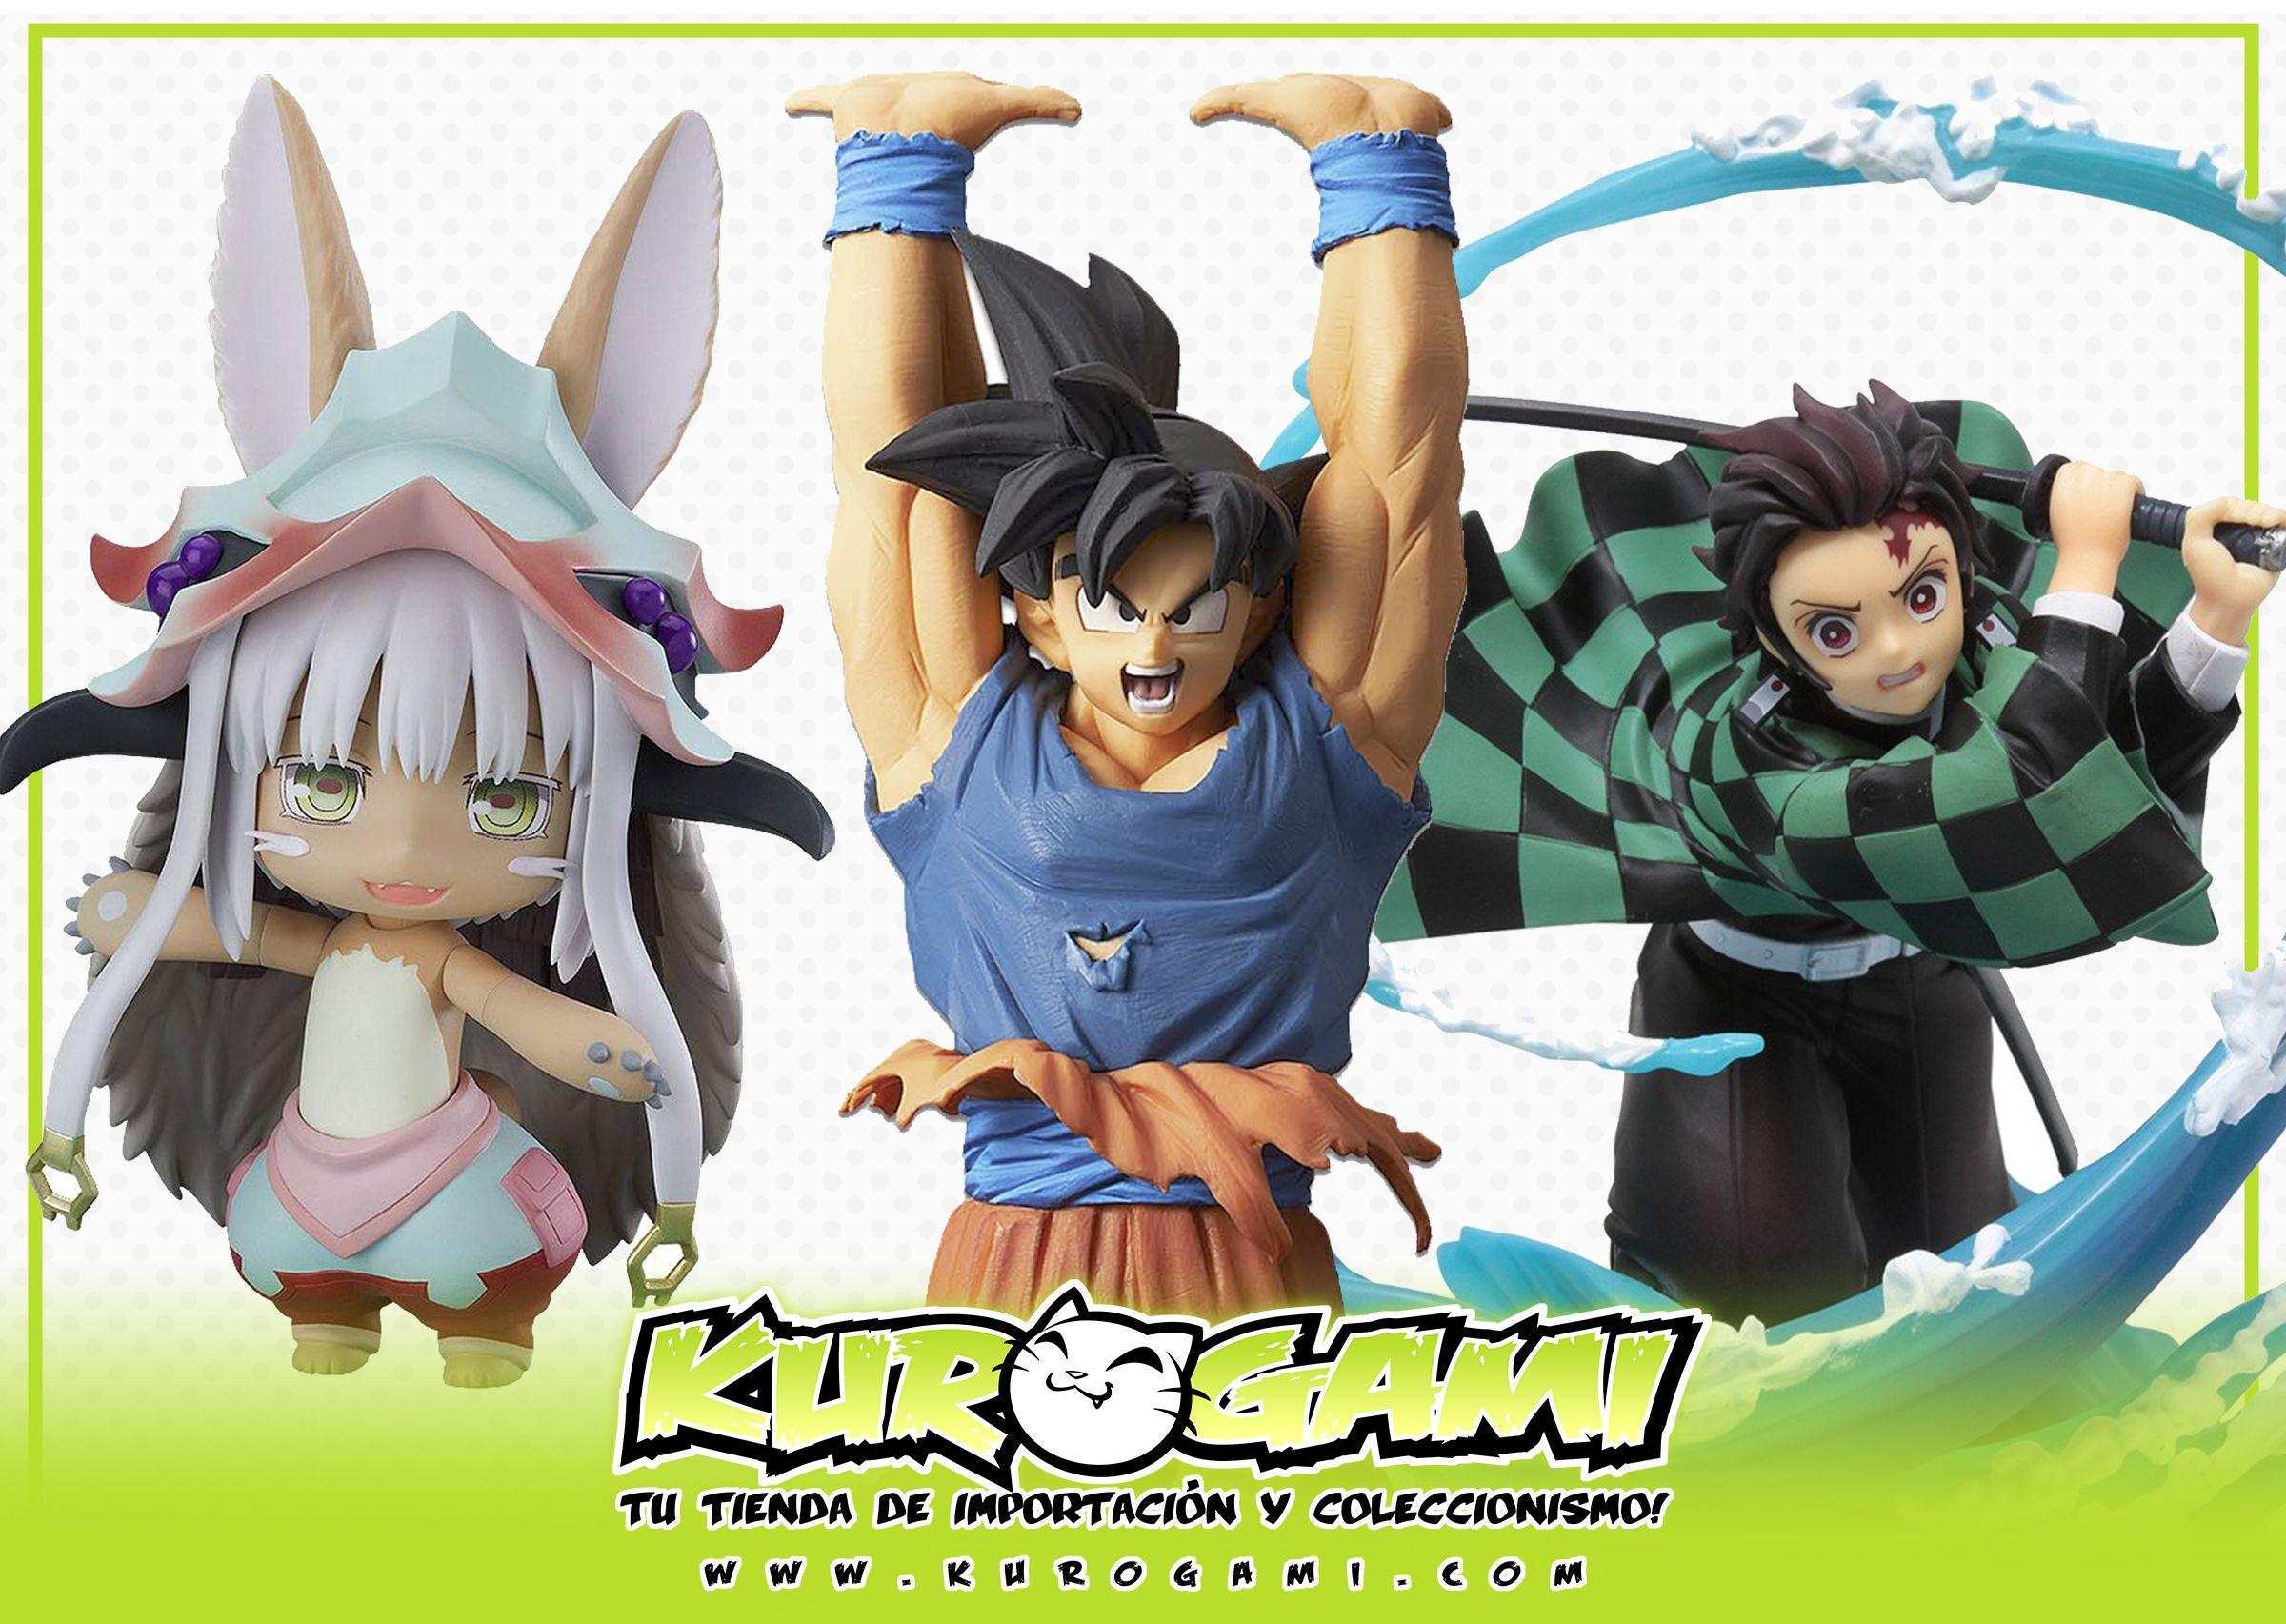 Visita la tienda de Kurogami coleccionismo